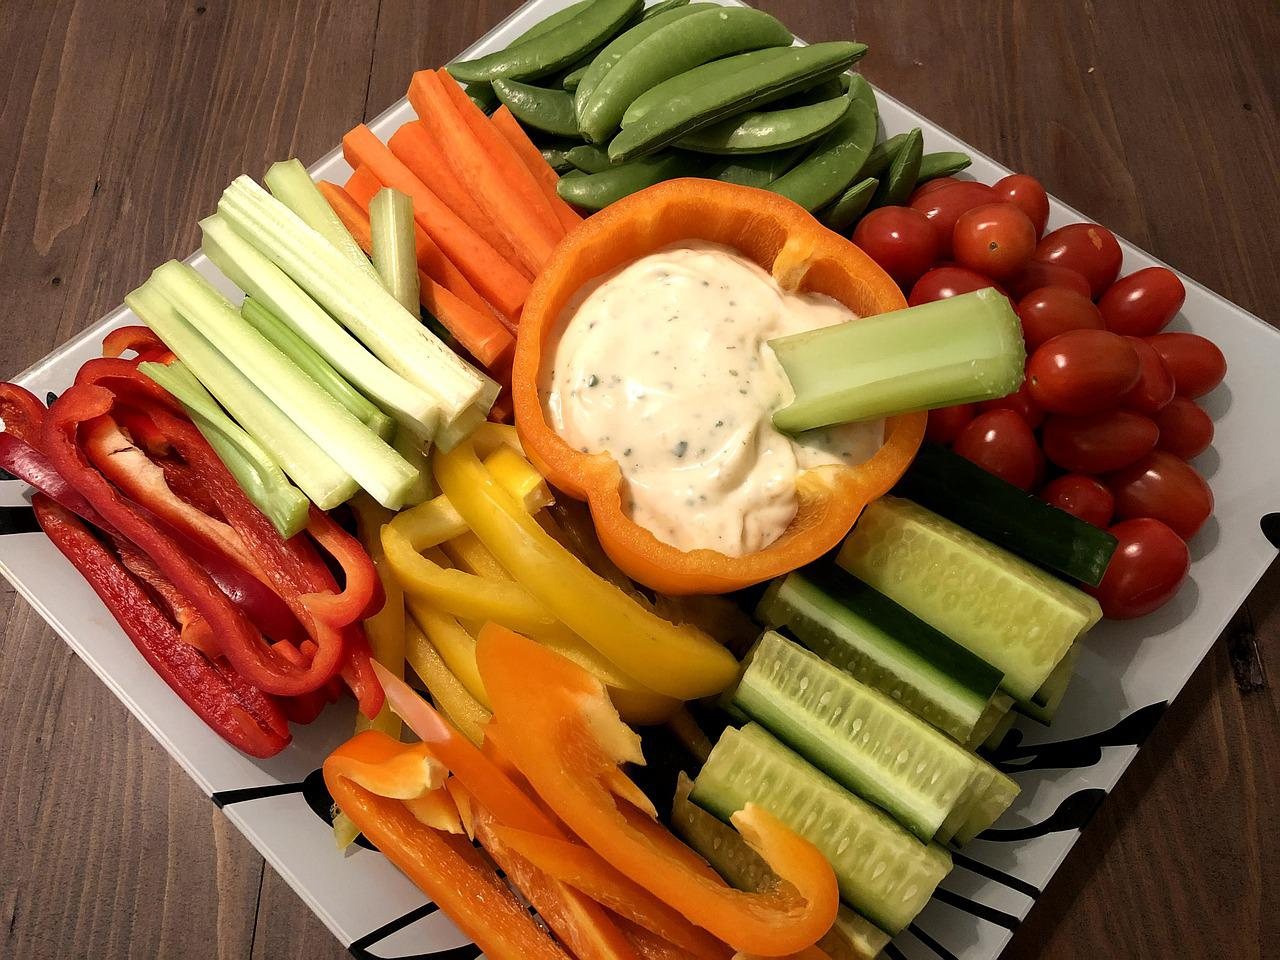 Veggie Platter Vegetables Raw Free Photo On Pixabay